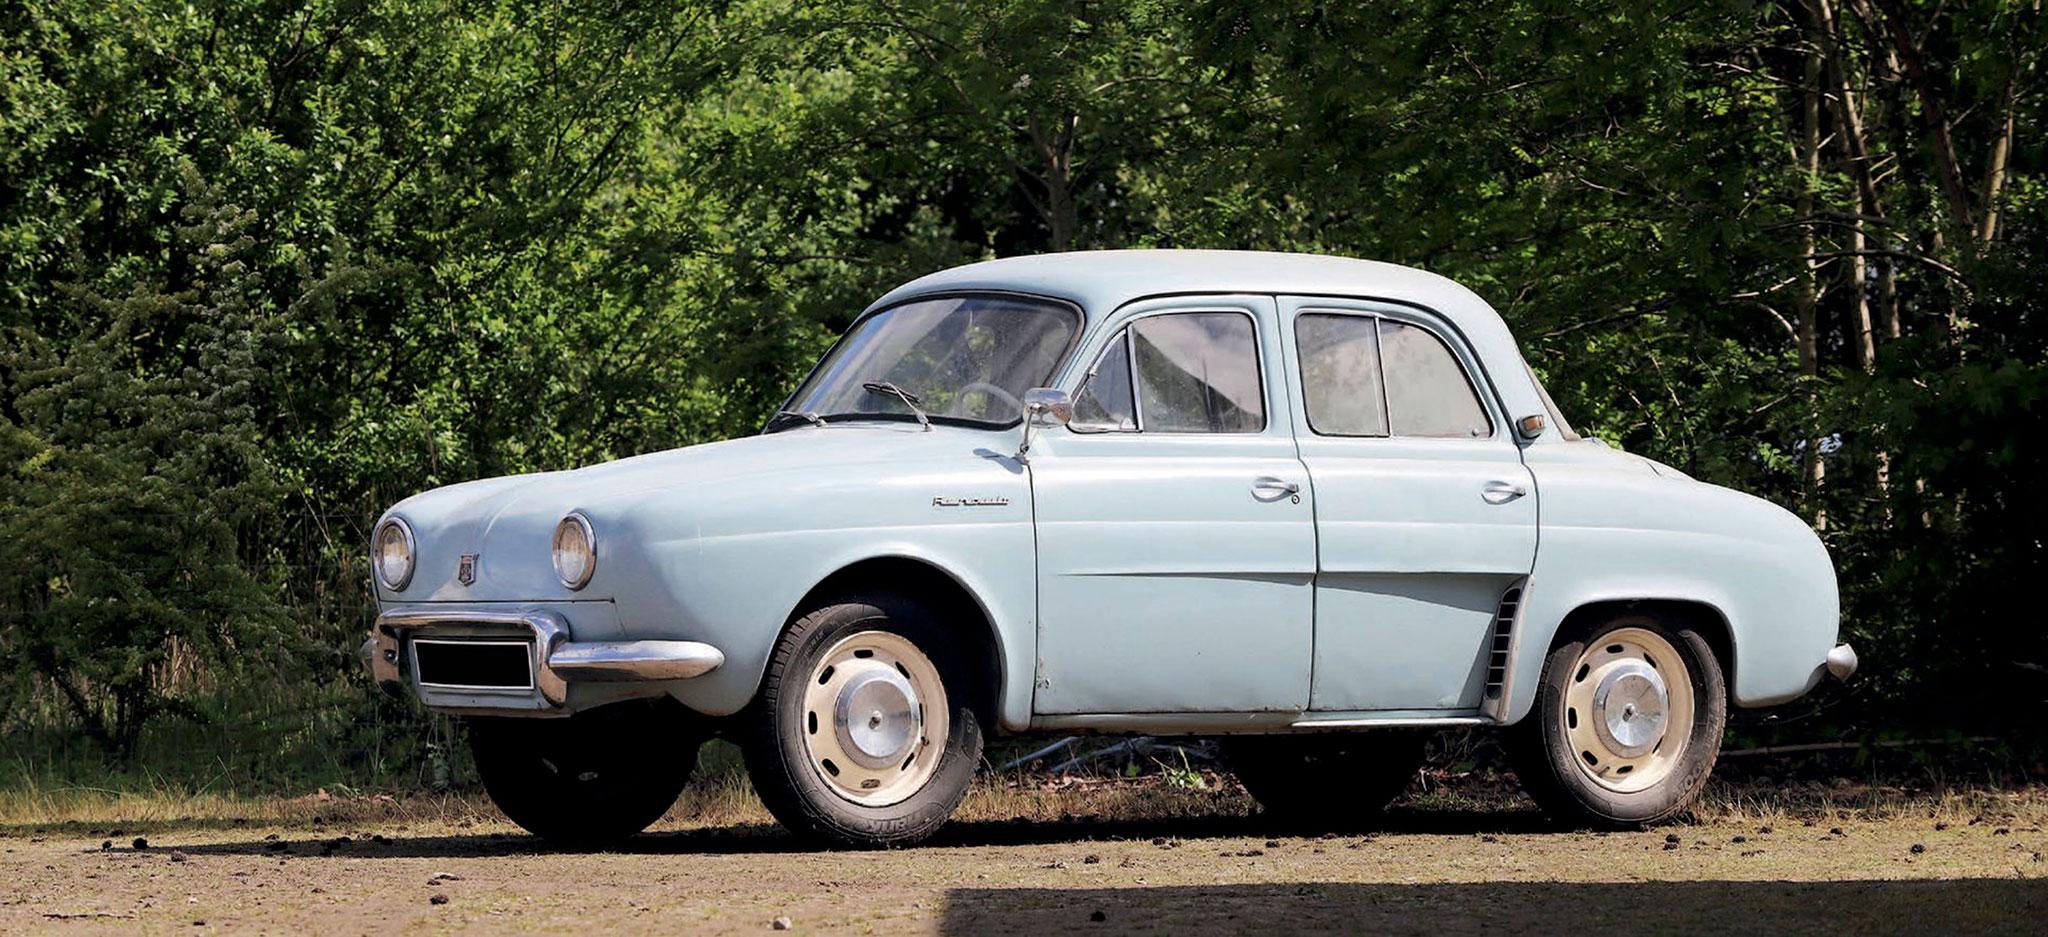 1958 Renault Dauphine 1090 €4000 - 6000 - Populaires Françaises.